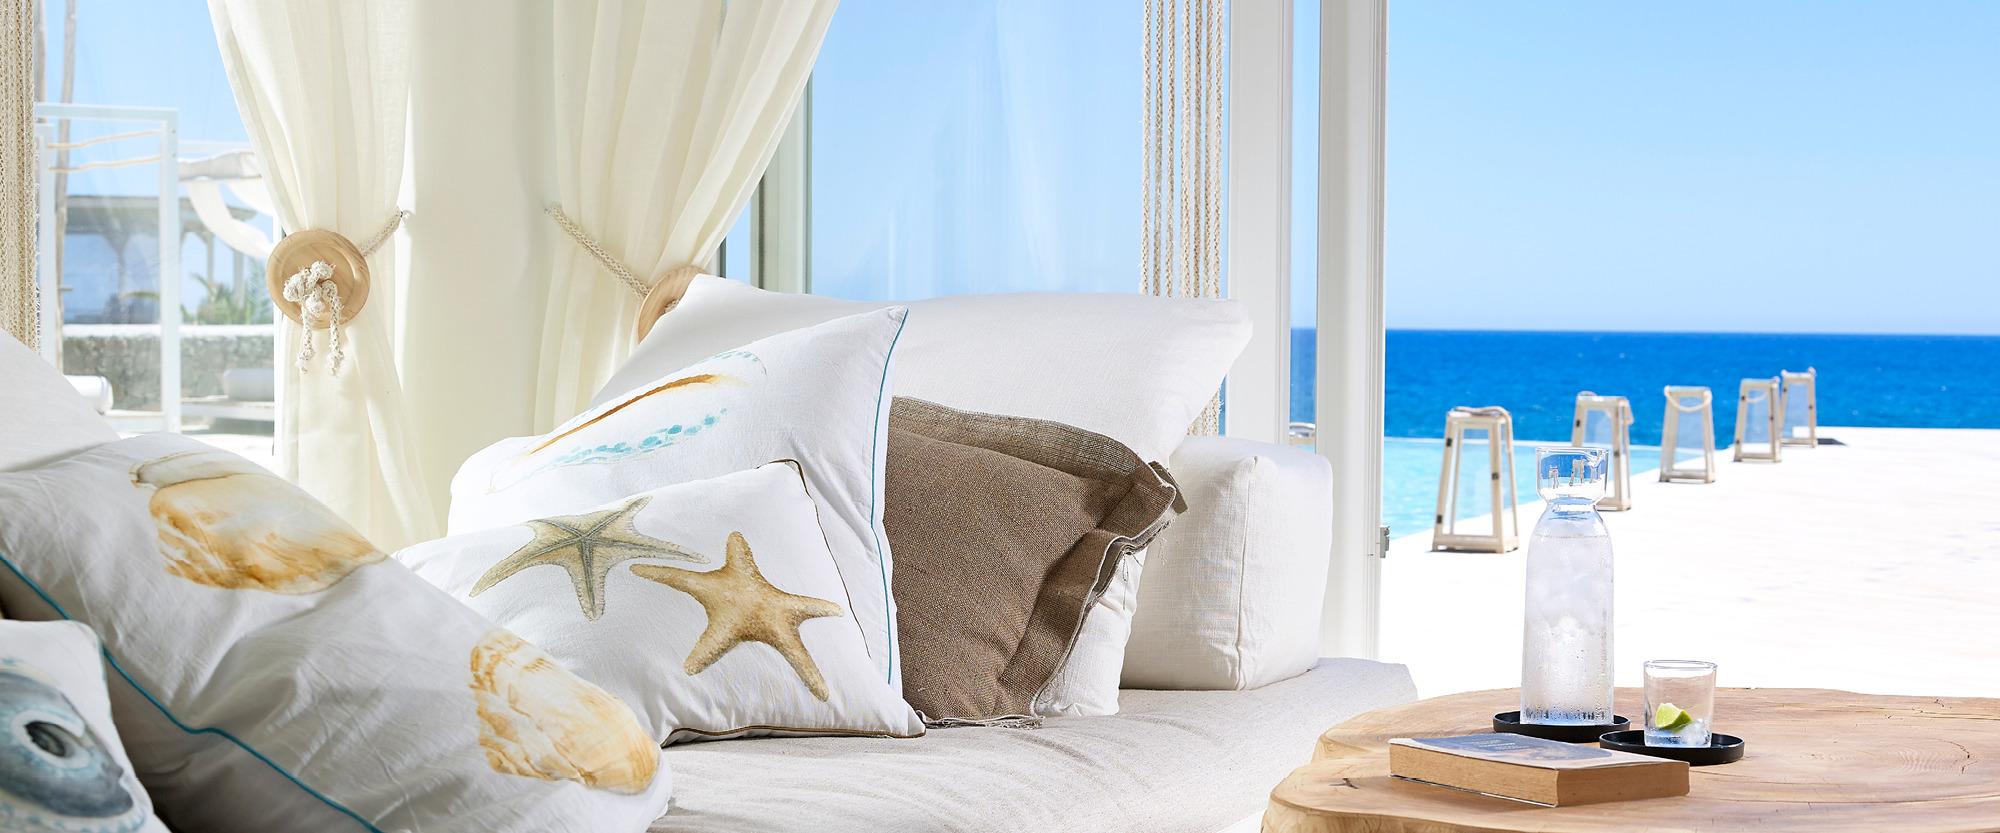 Lobby__pool_bar__interior_decoration_design_minimalism_luxury__classy_modern_summer_relaxing_Artemis_Deluxe_Rooms_Milos_island_Milos_island